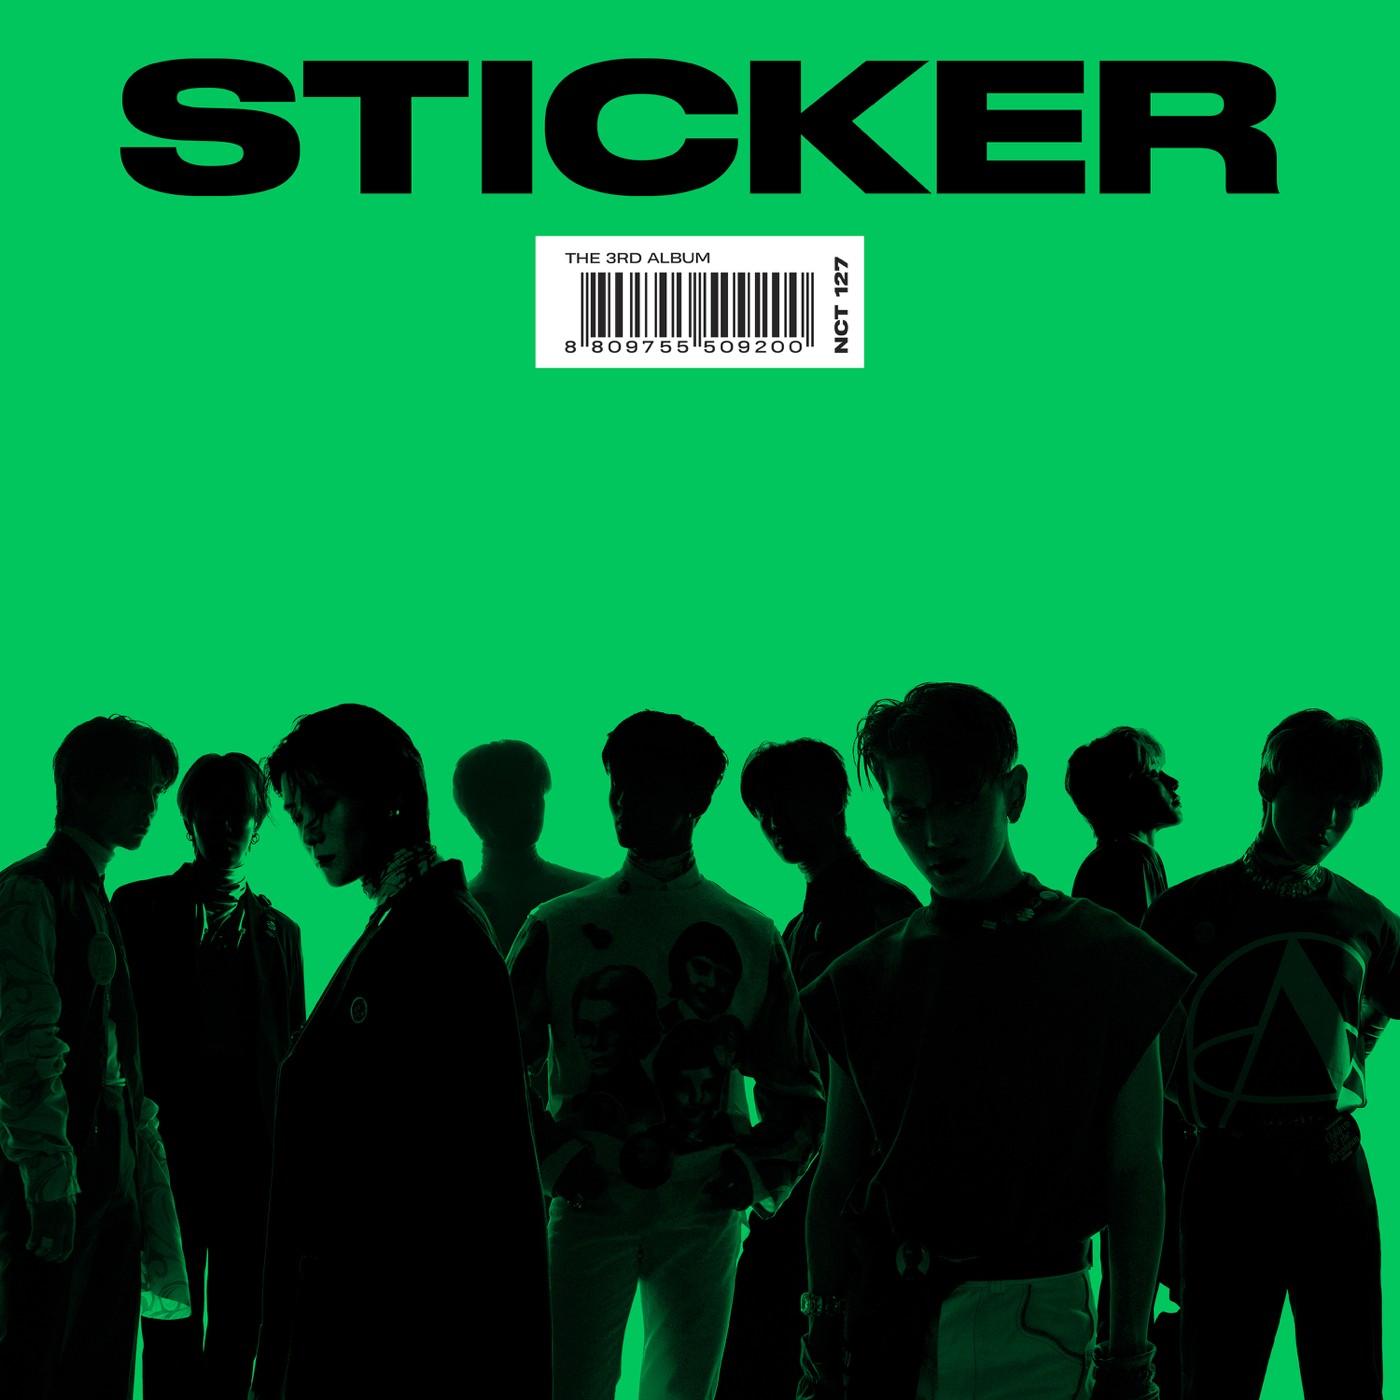 [Album] NCT 127 – Sticker – The 3rd Album [24bit Lossless + MP3 320 / WEB] [2021.09.17]